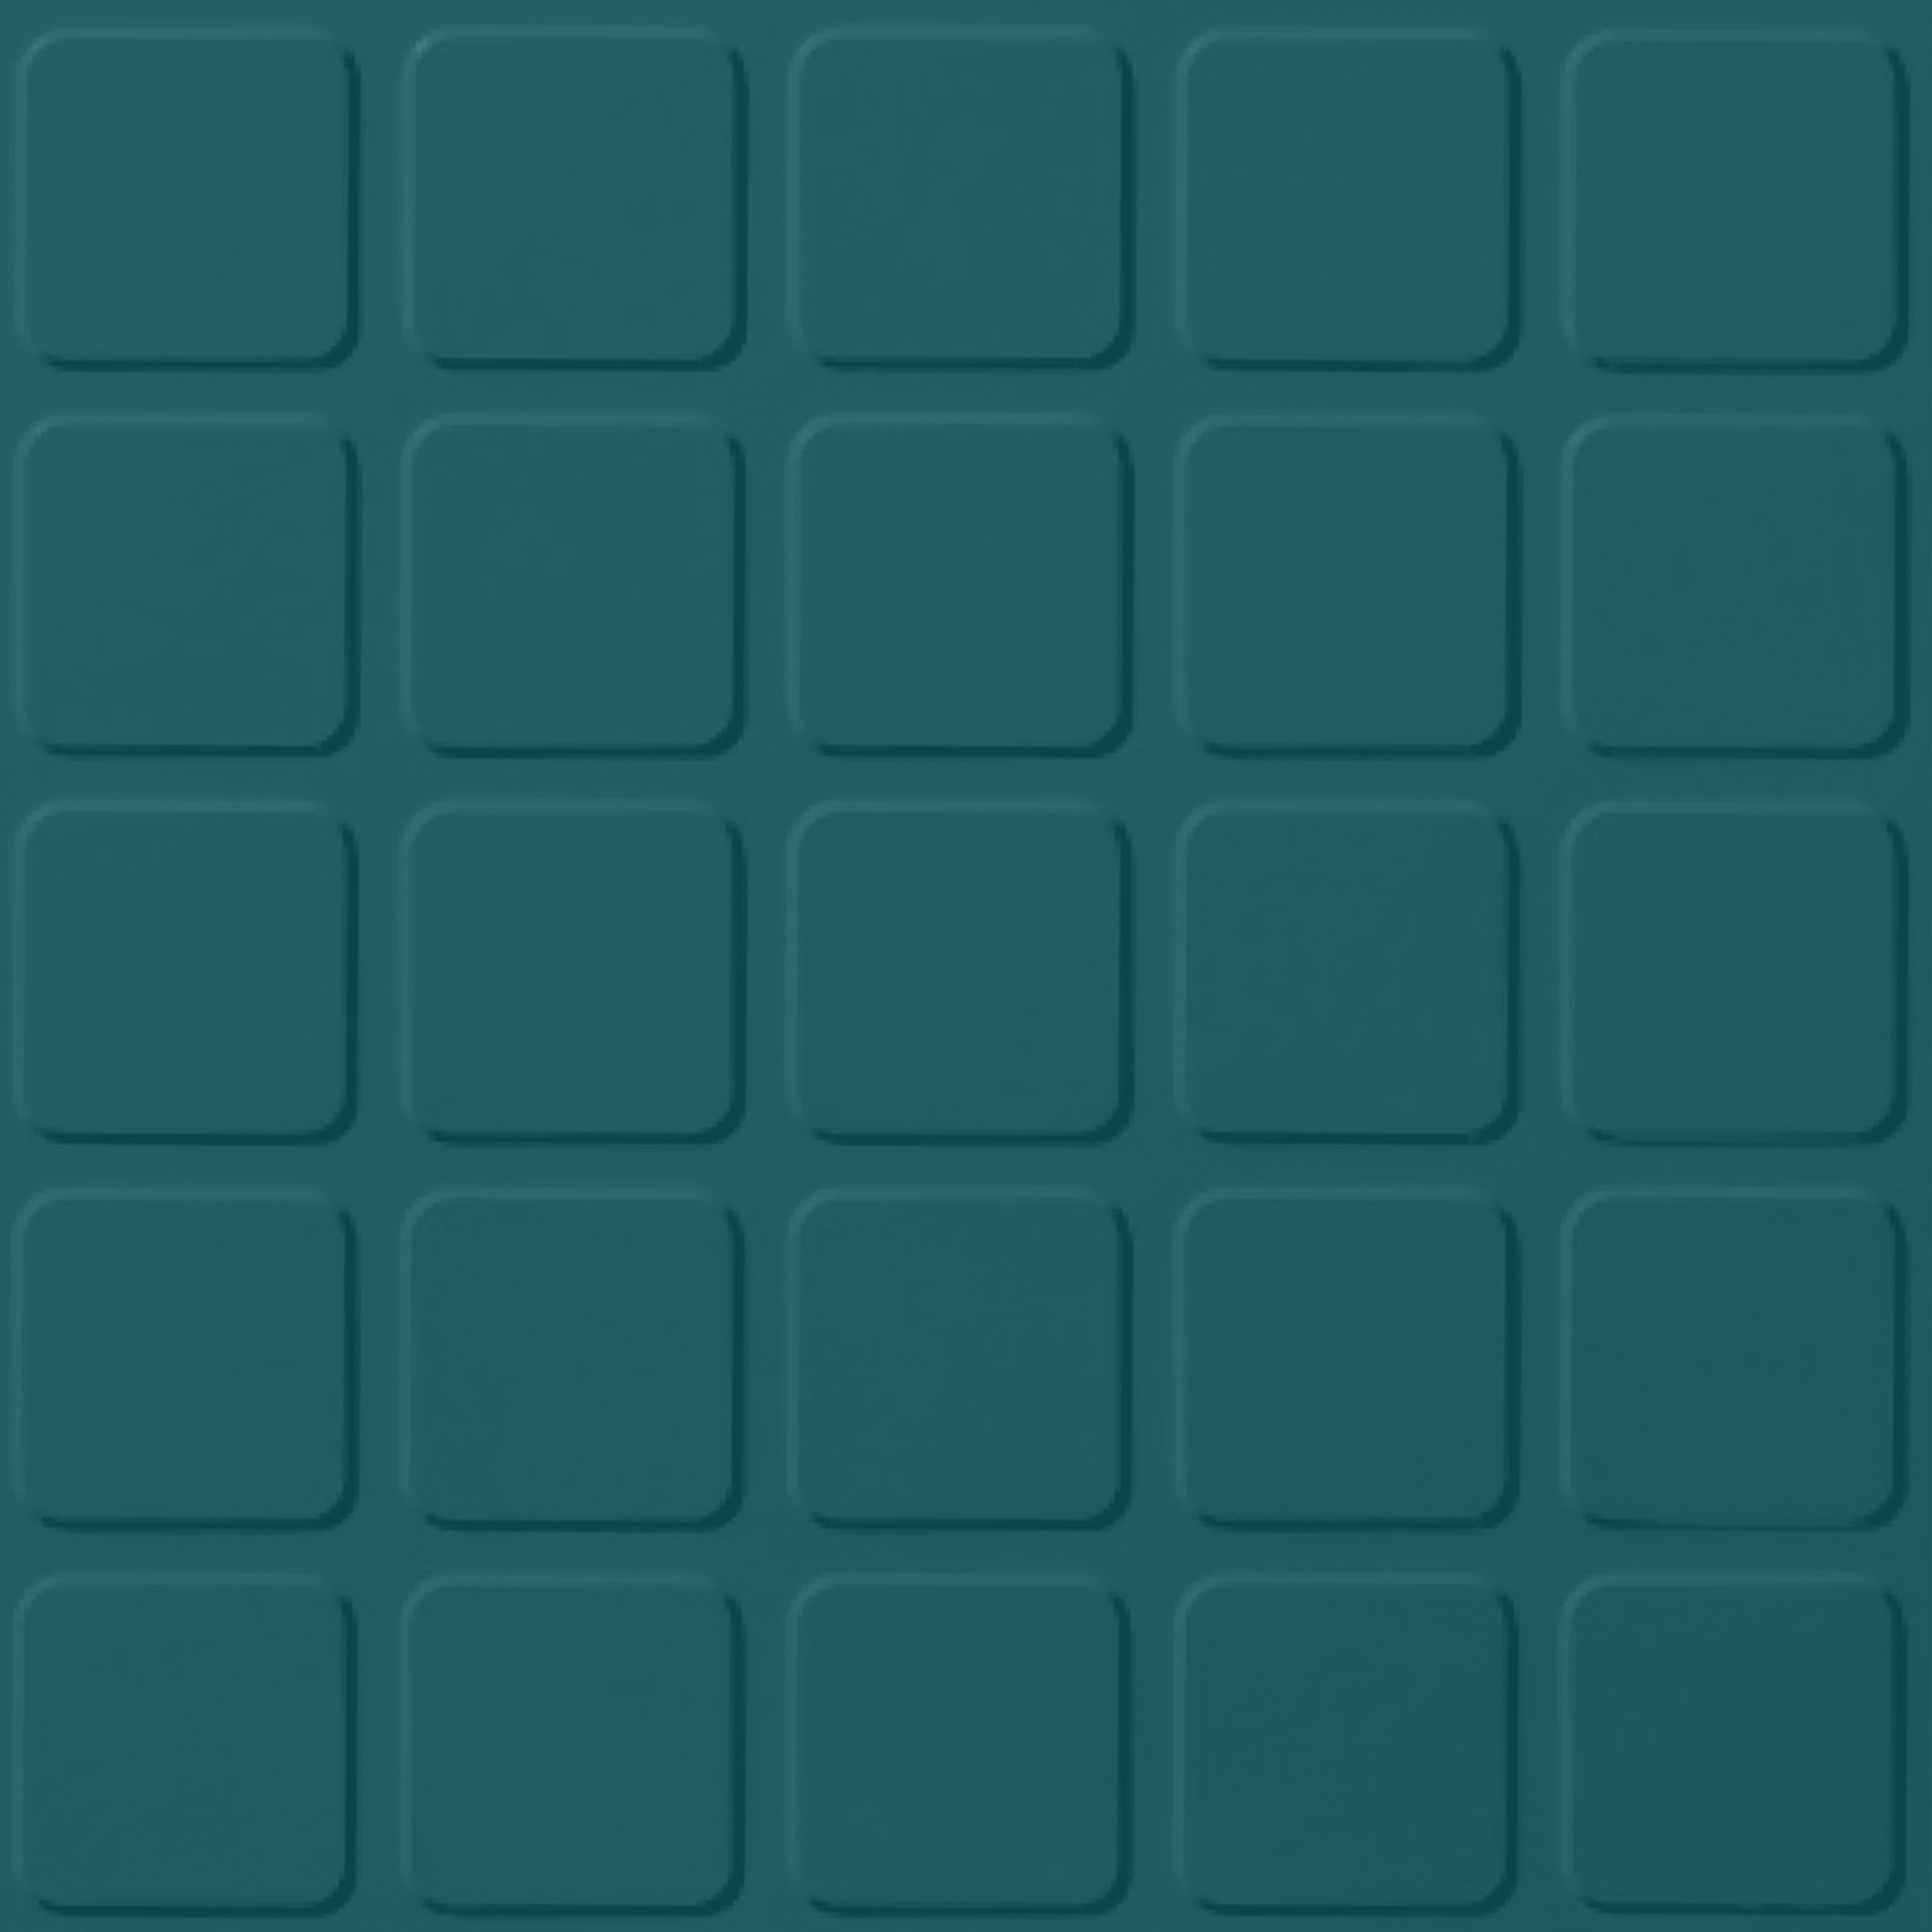 Roppe Rubber Tile 900 - Raised Square Design (994) Peacock Rubber Flooring